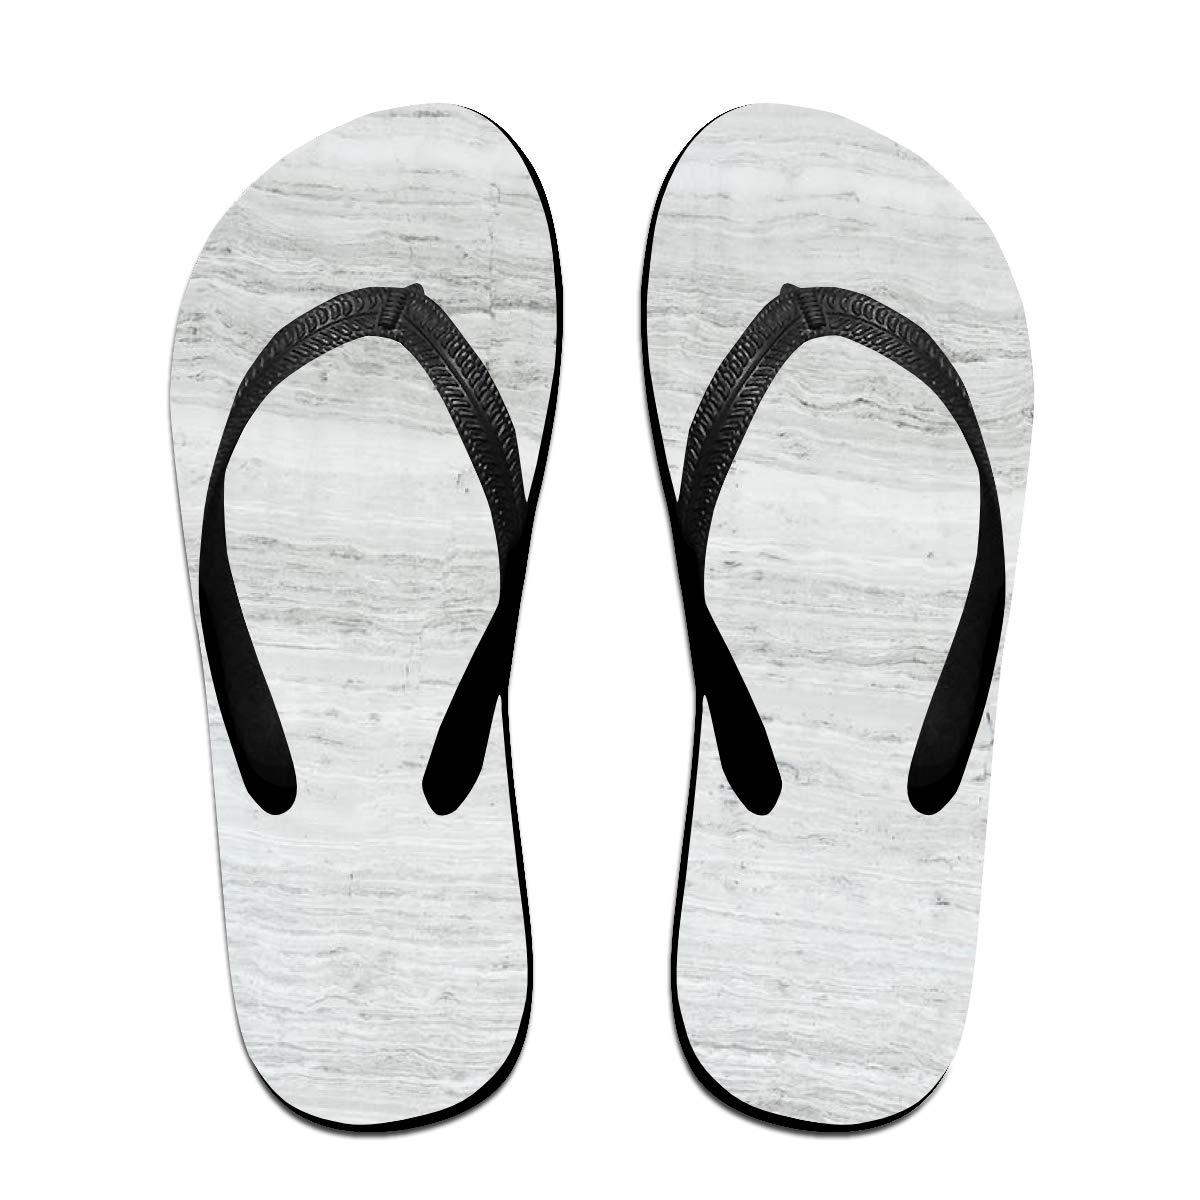 9ea3d01ec1691 Amazon.com: White Marble Men's And Women's Flip-flops Summer Beach ...